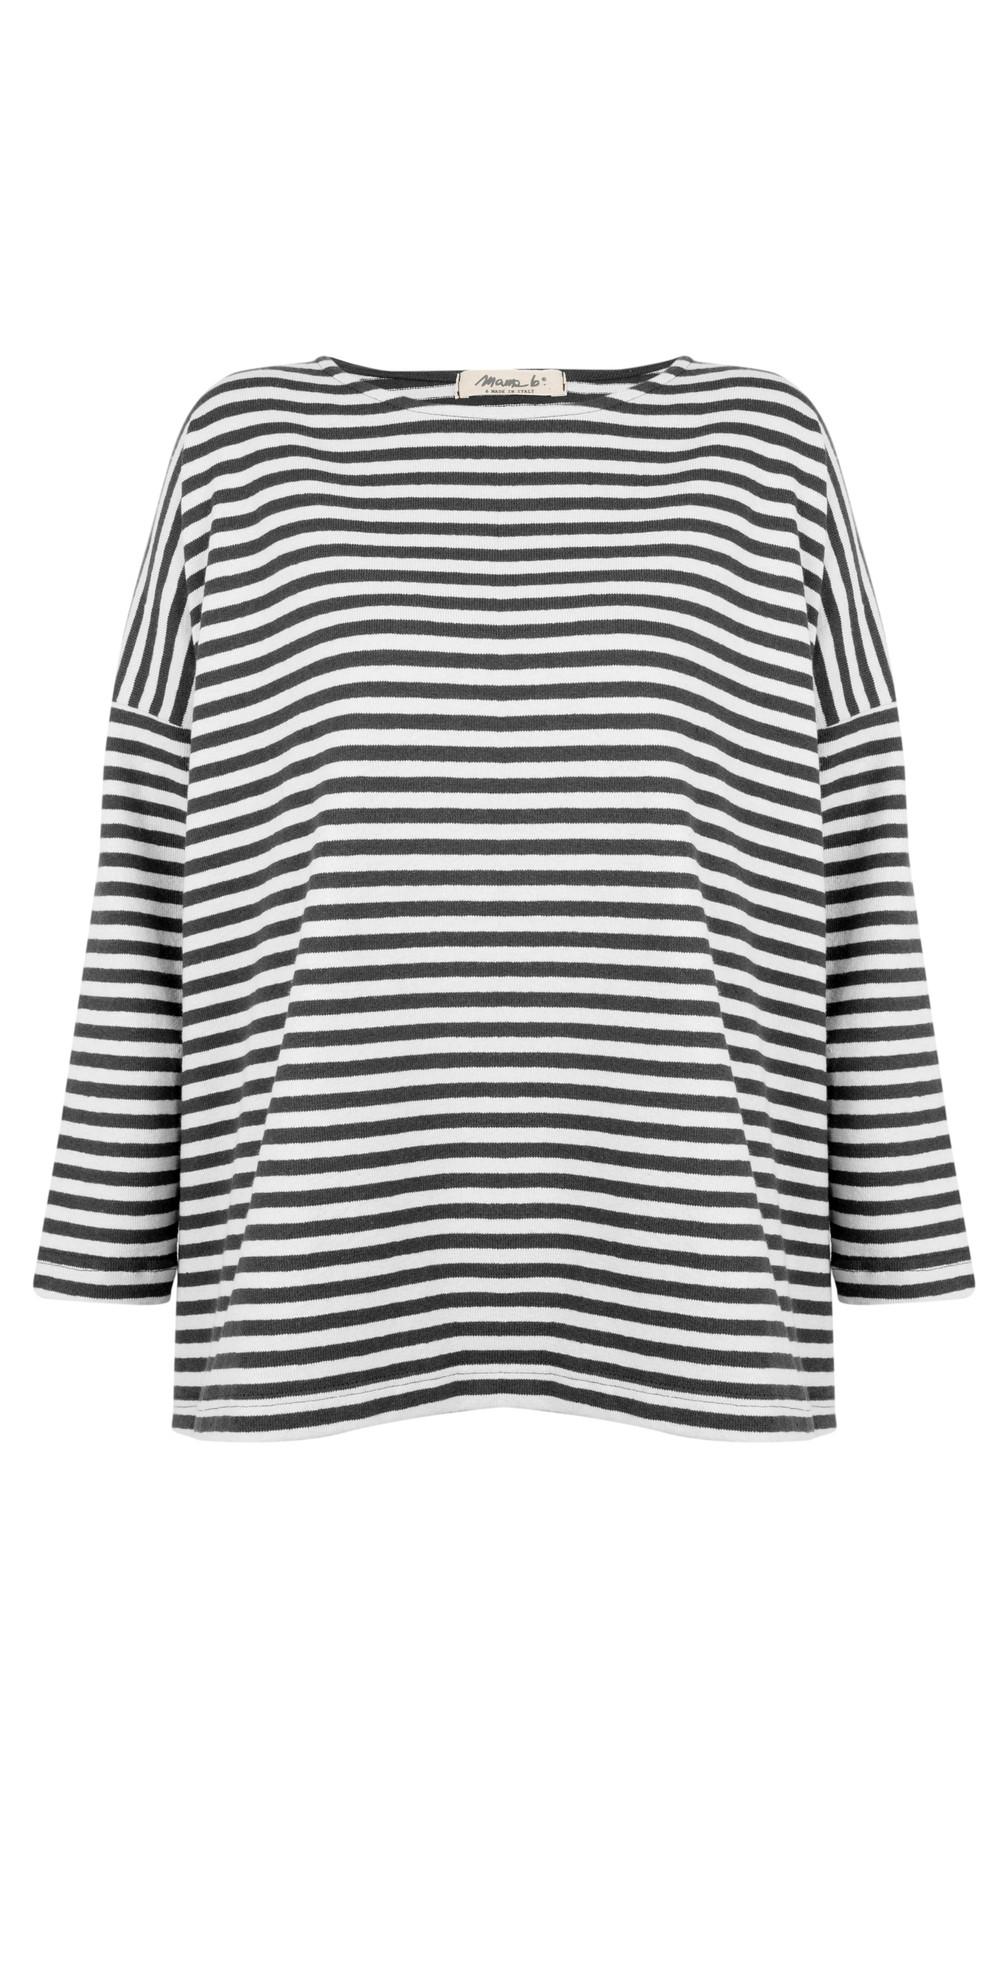 Ruche Stripe Fleece Top main image